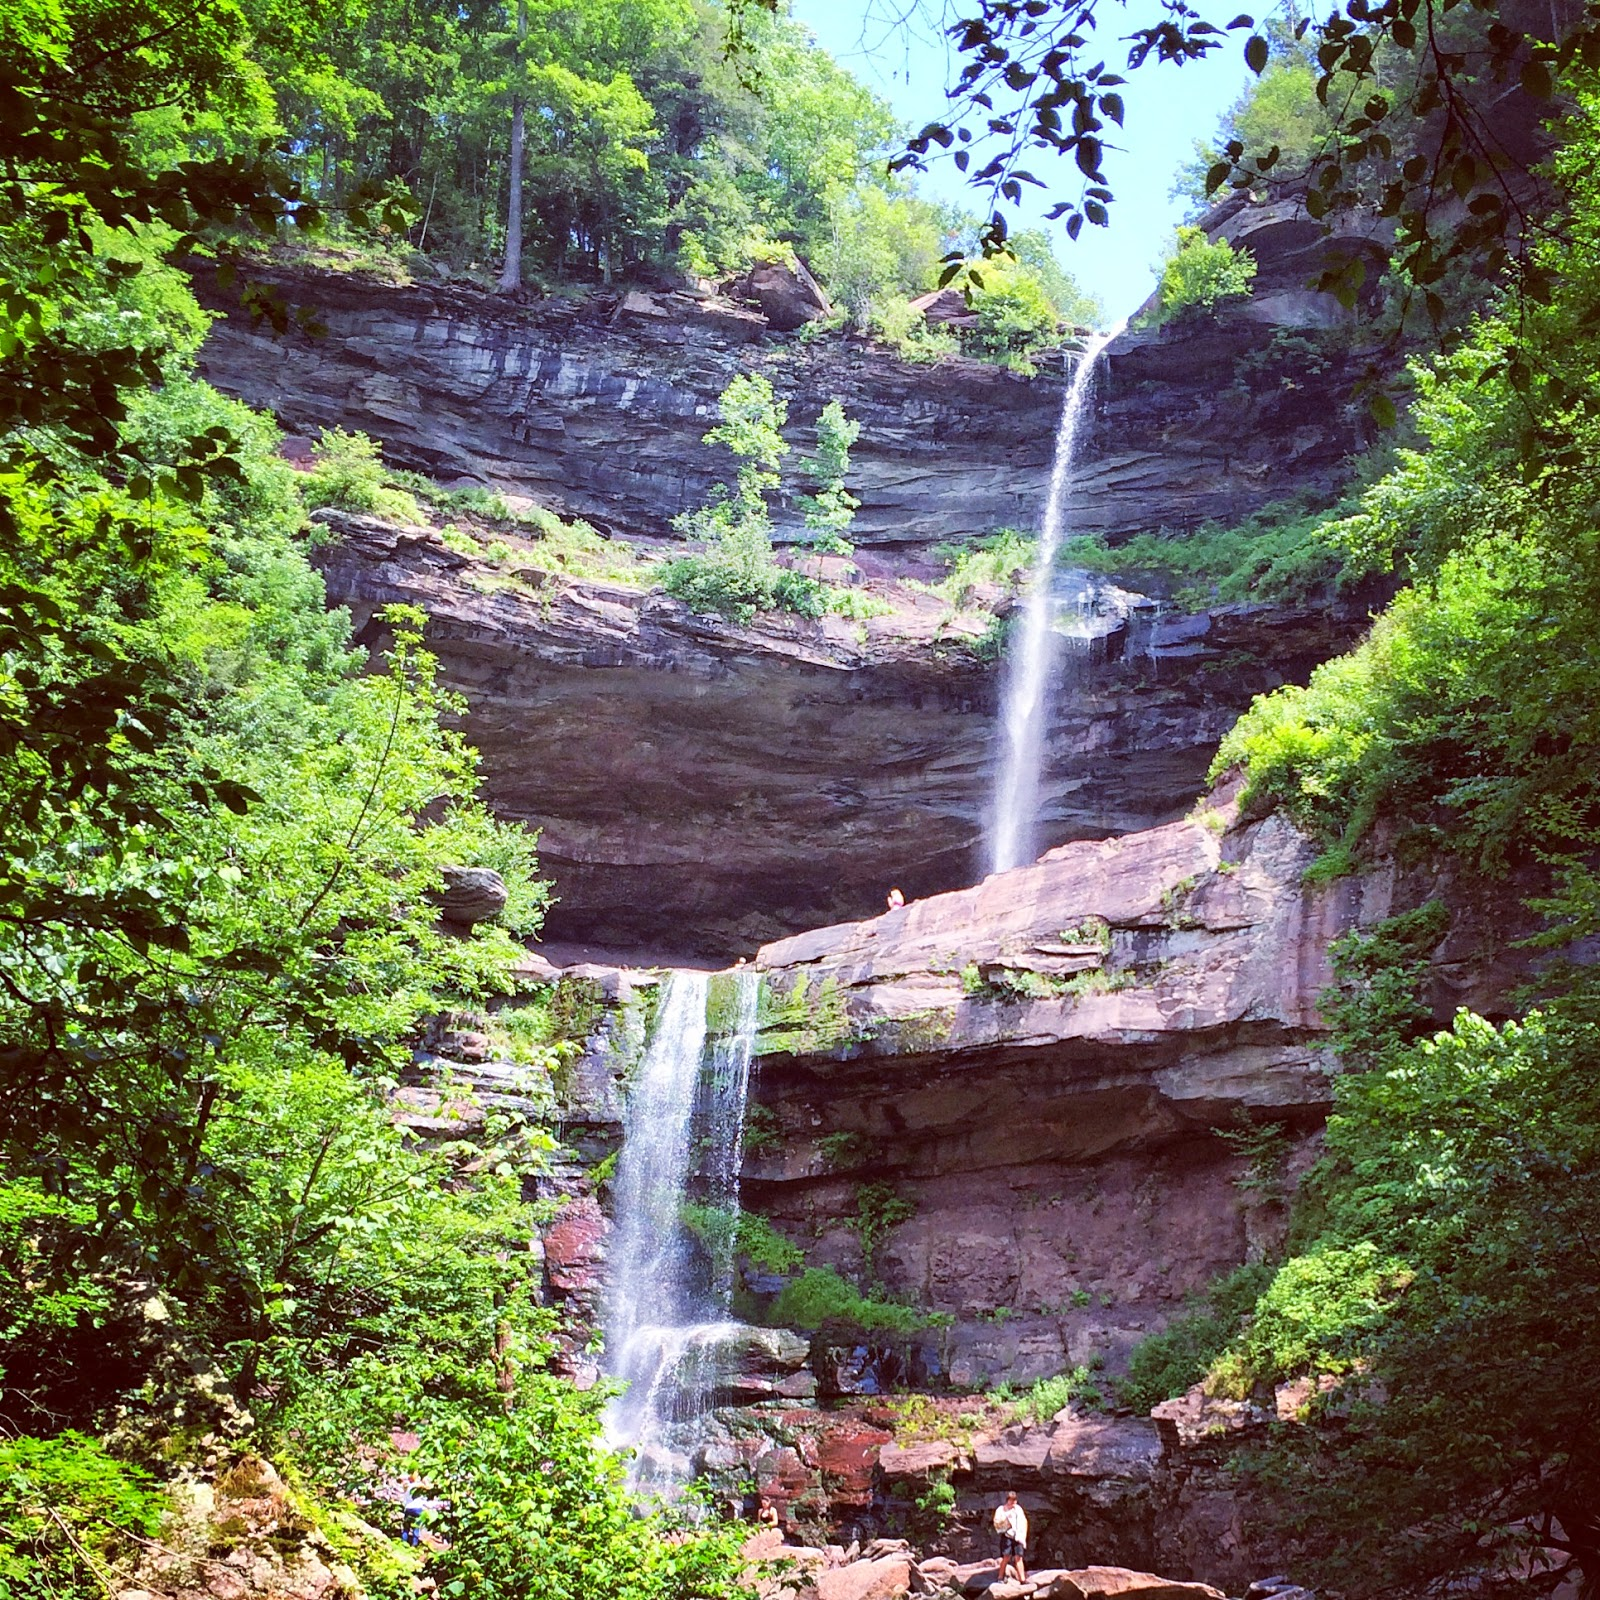 Warriors Path State Park Campground: Catskill Trails, Catskill Hikes